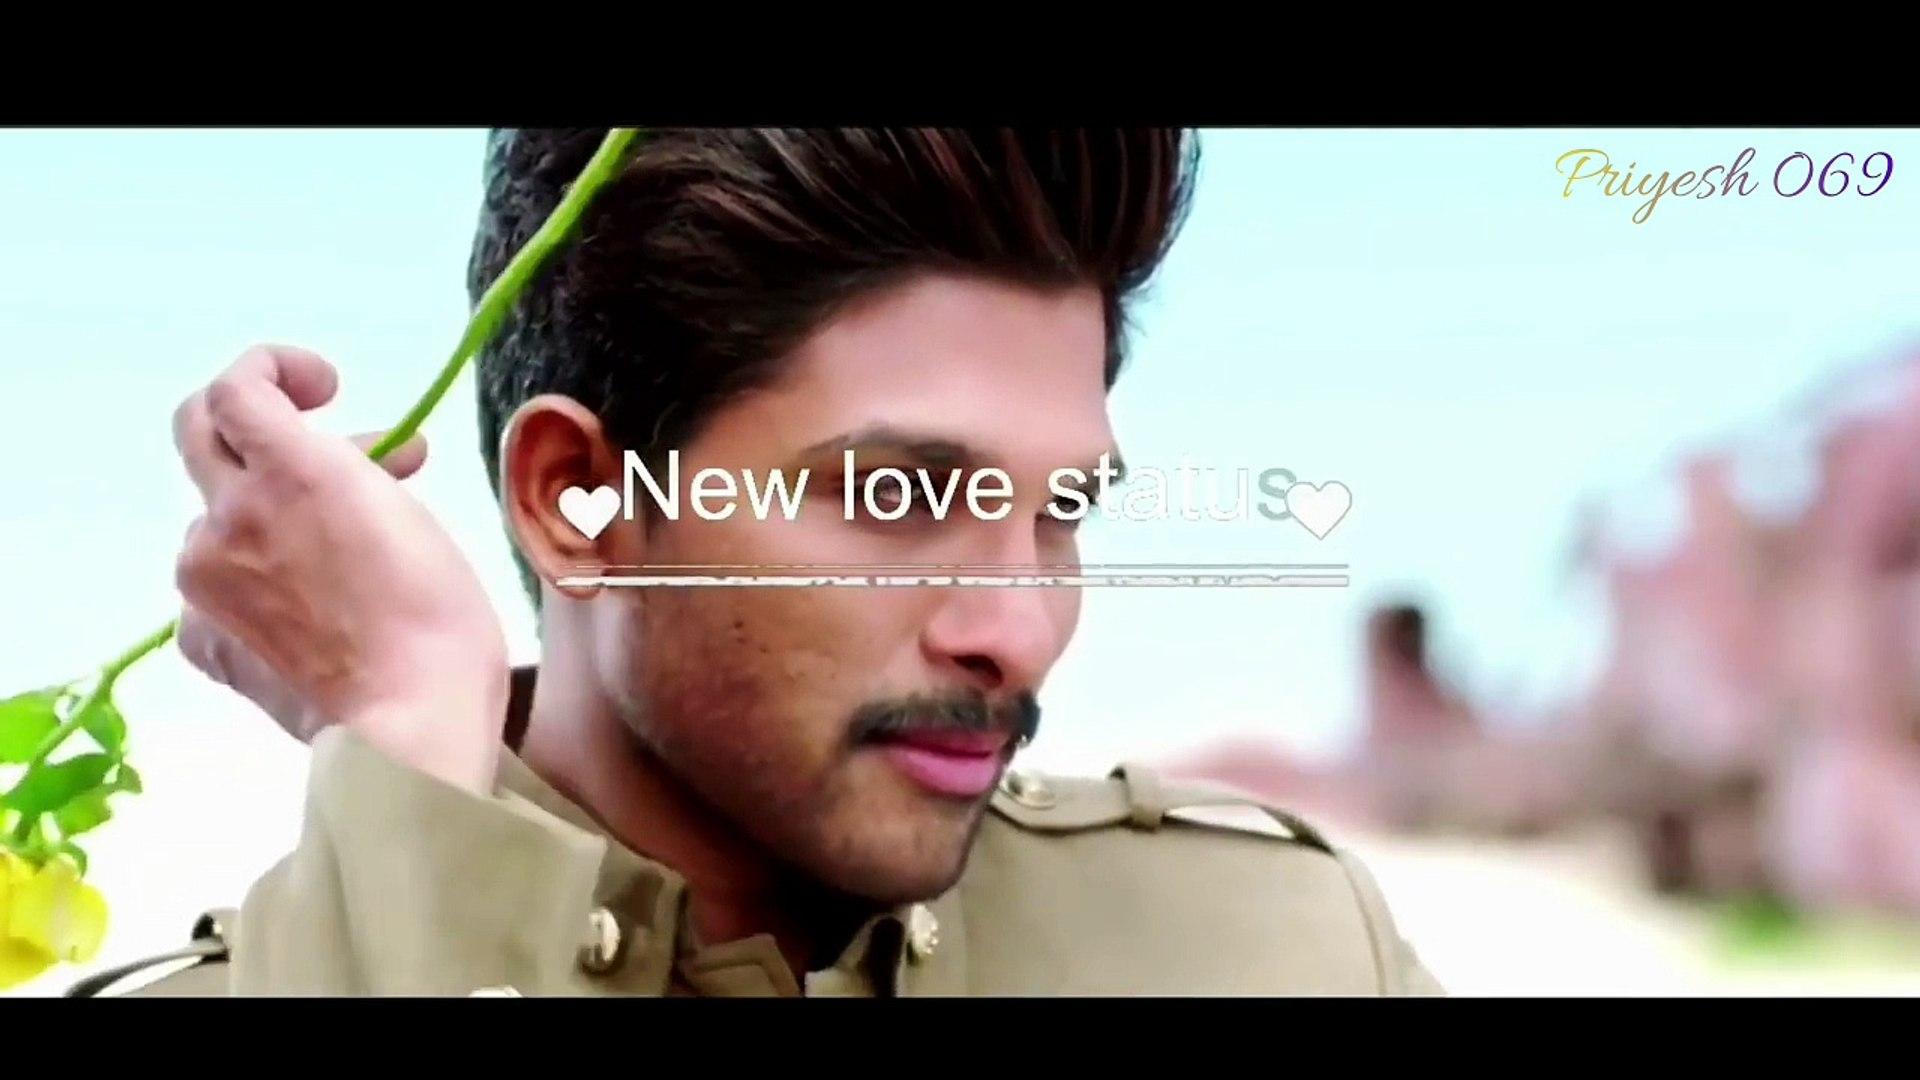 Allu Arjun full romantic WhatsApp status video | WhatsApp status only 40  sec with romantic song | priyesh069